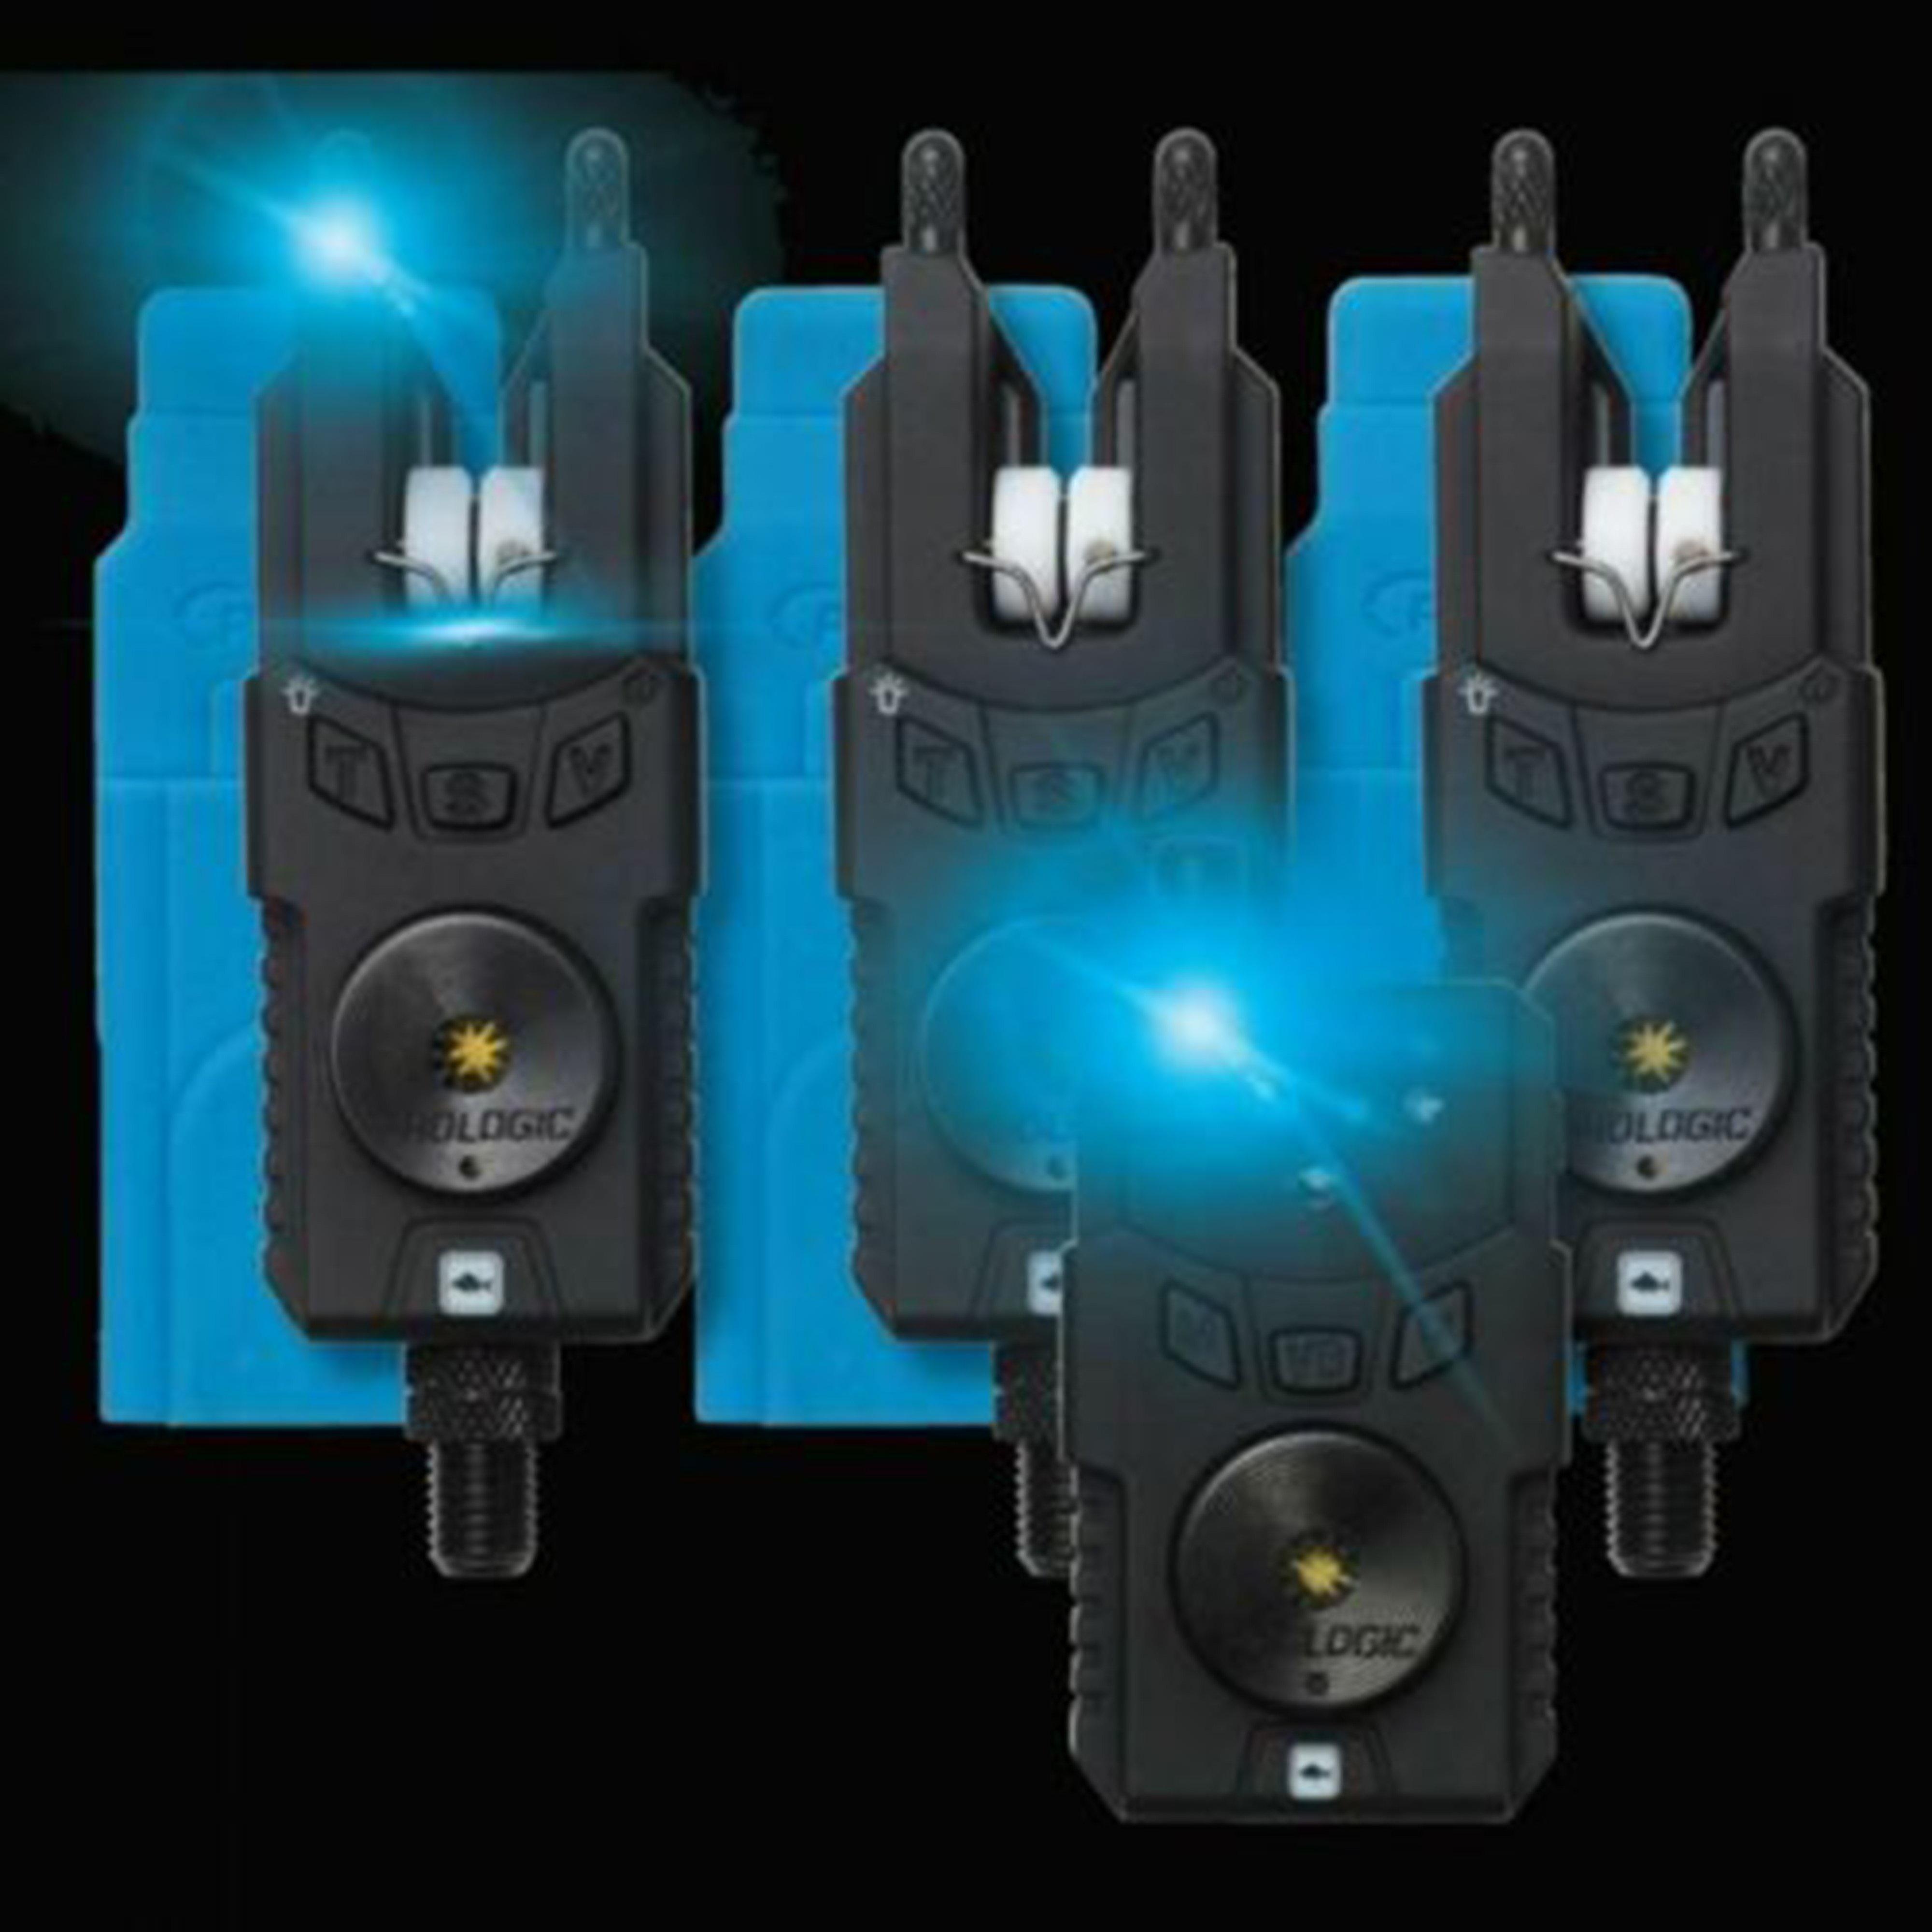 Prologic Smx Alarms 3 Plus 1 - Black/Blue, Black/Blue